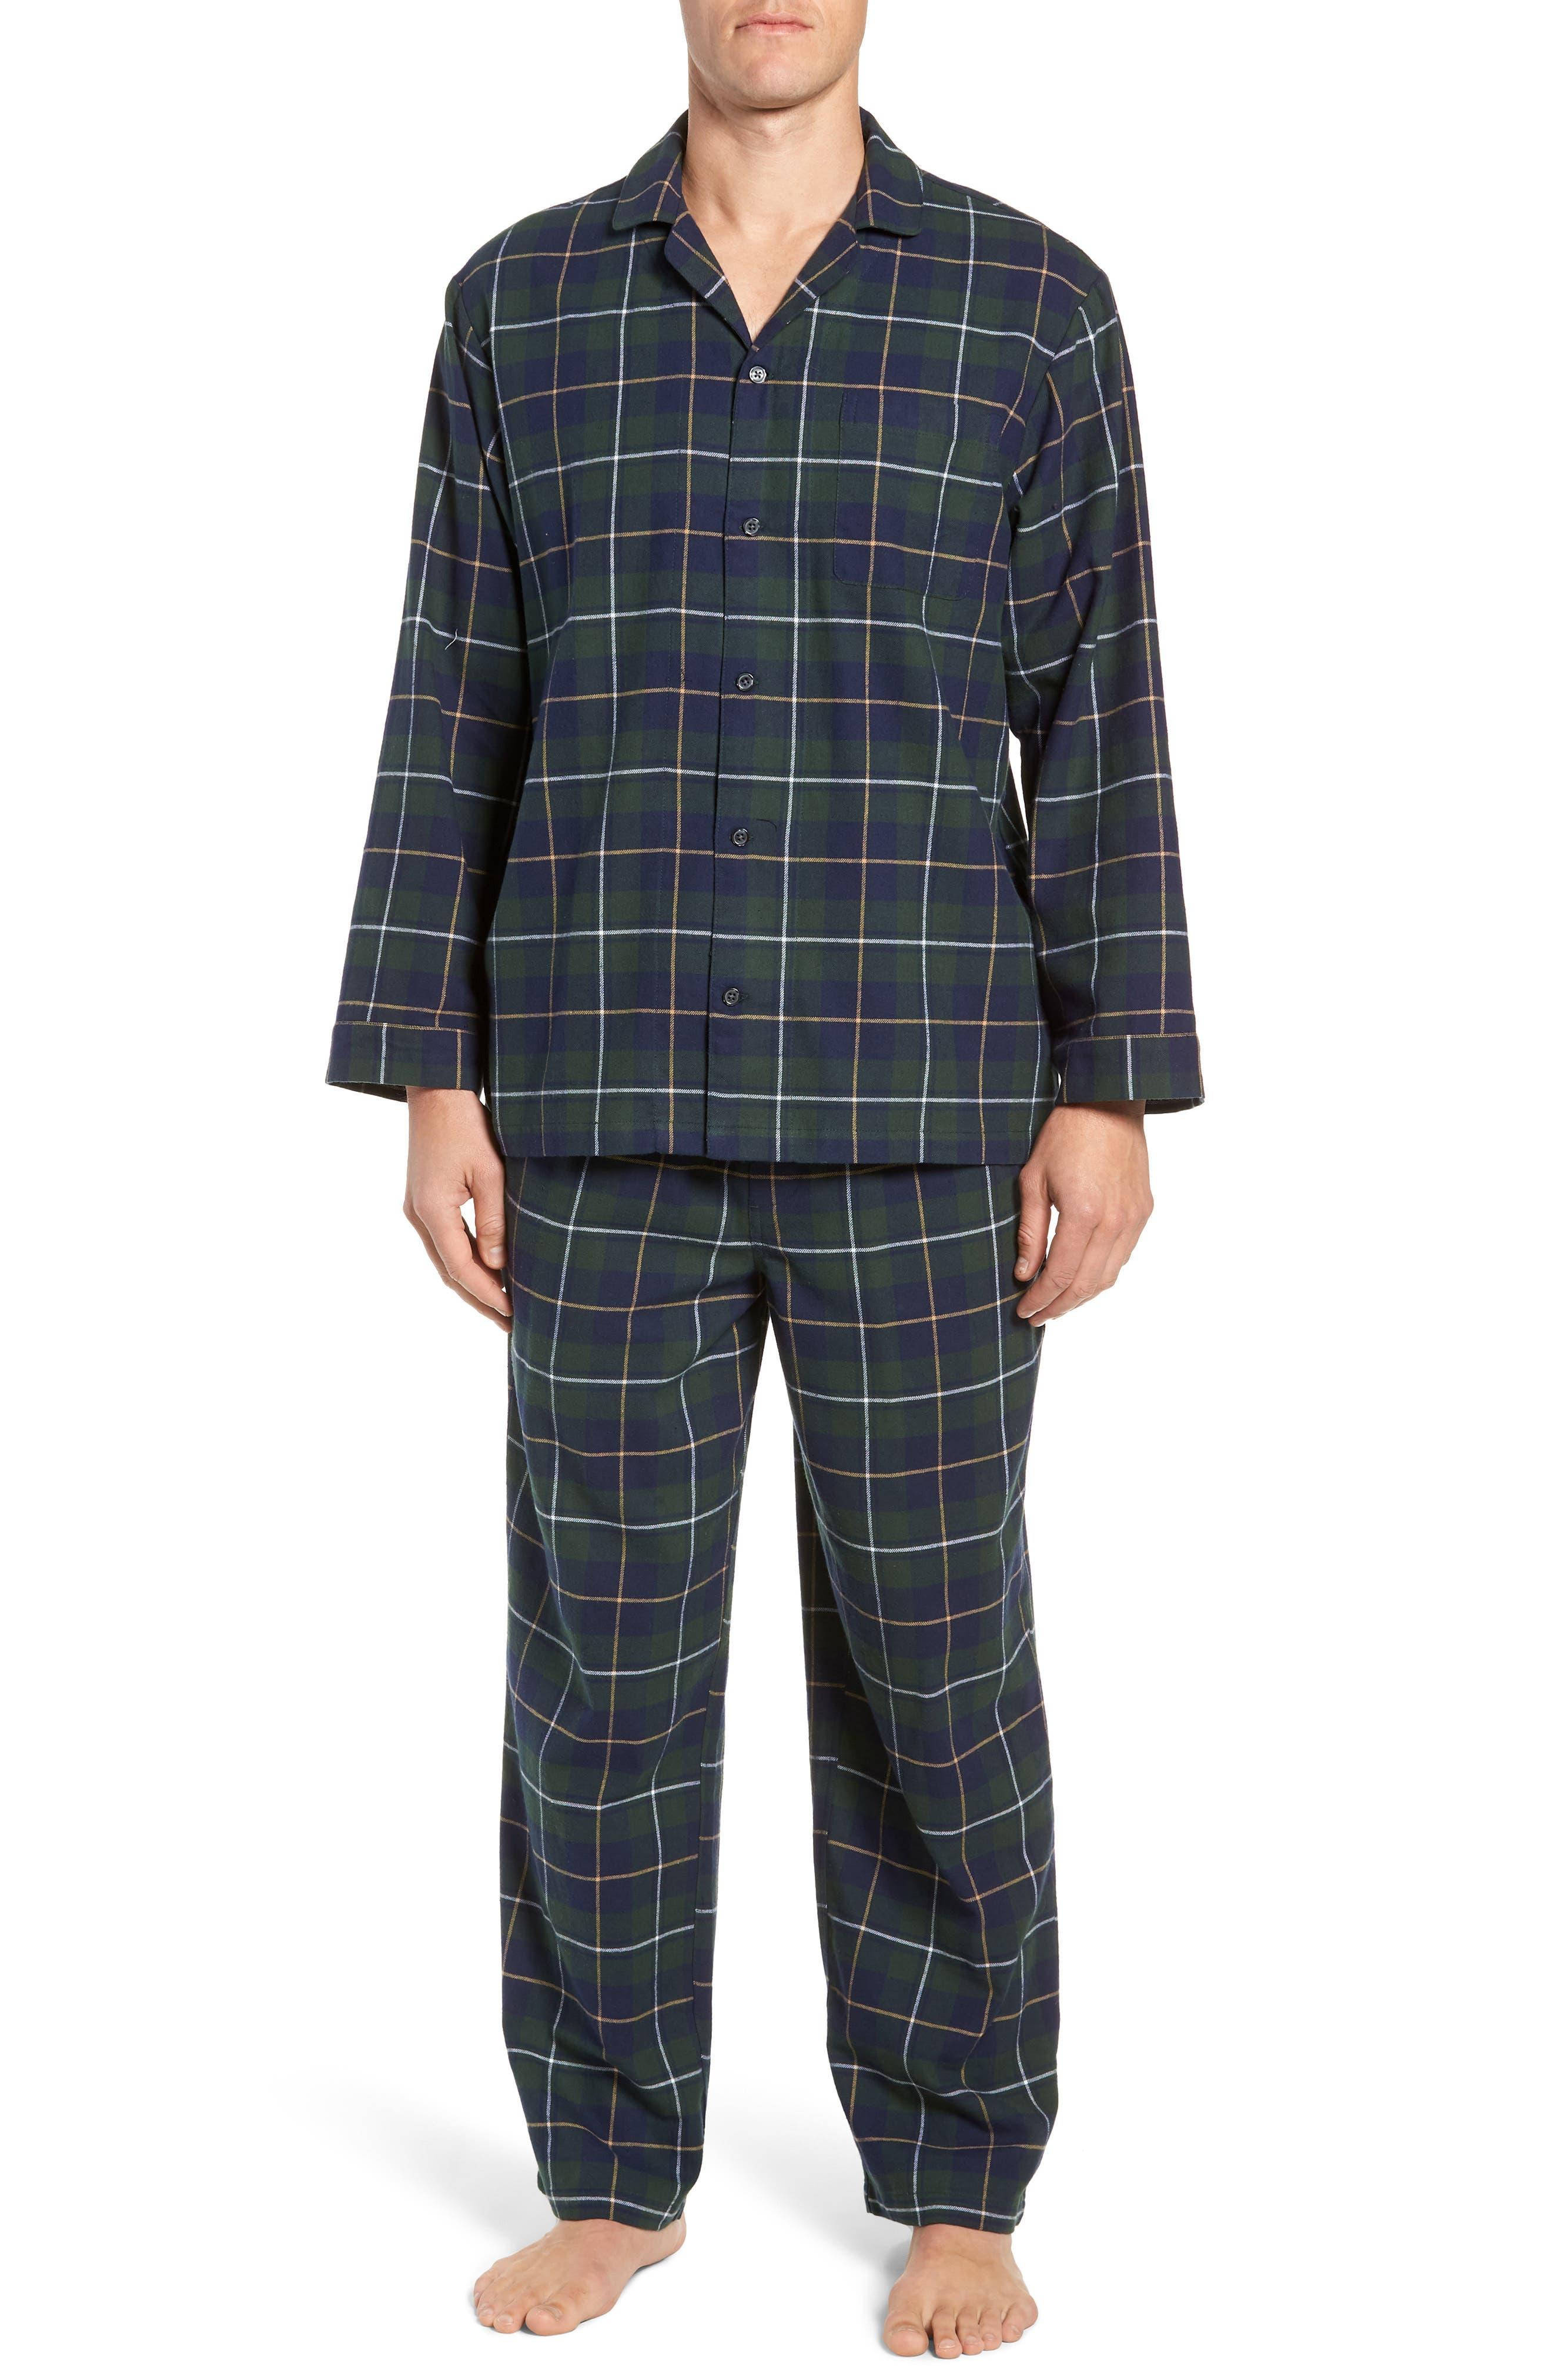 '824' Flannel Pajama Set,                         Main,                         color, GREEN CHARCOAL FADED PLAID